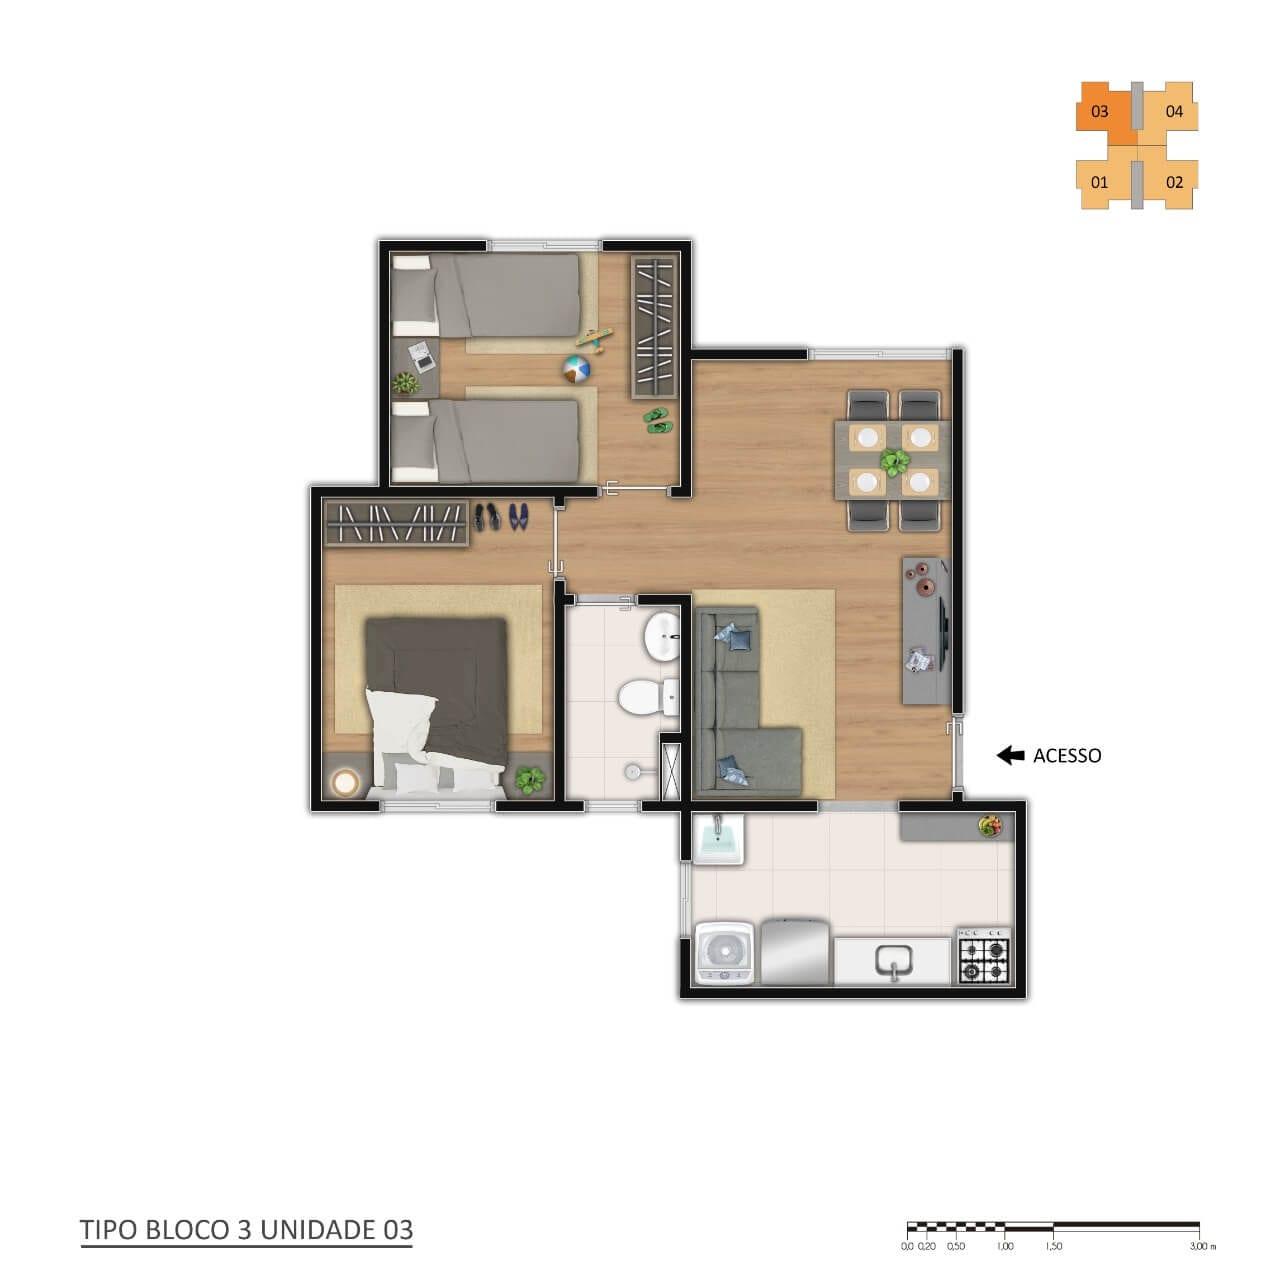 vic-engenharia-villa-vic-bilbao-apartamento-tipo-bloco-3-a-30